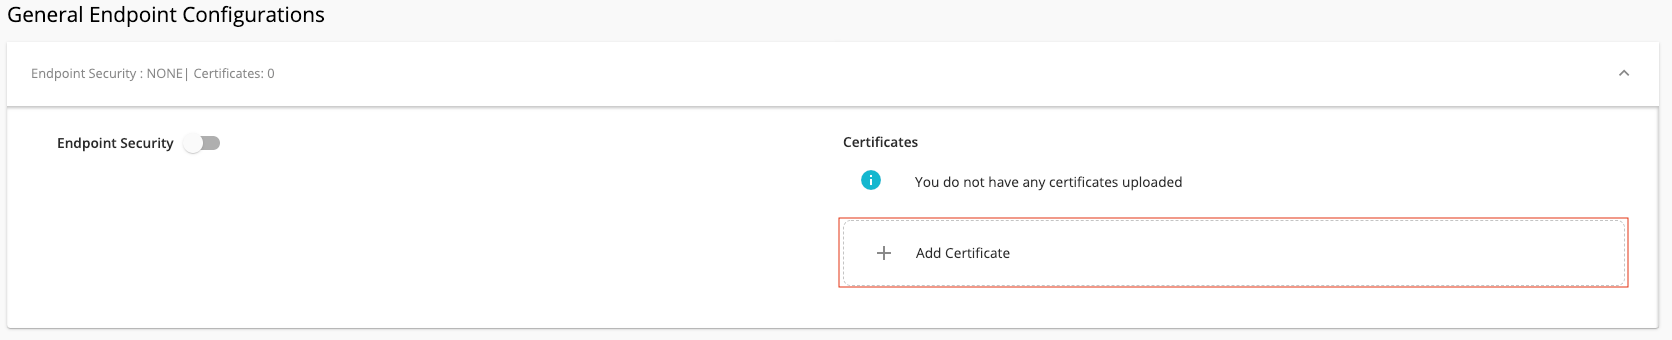 Click on Add Certificate